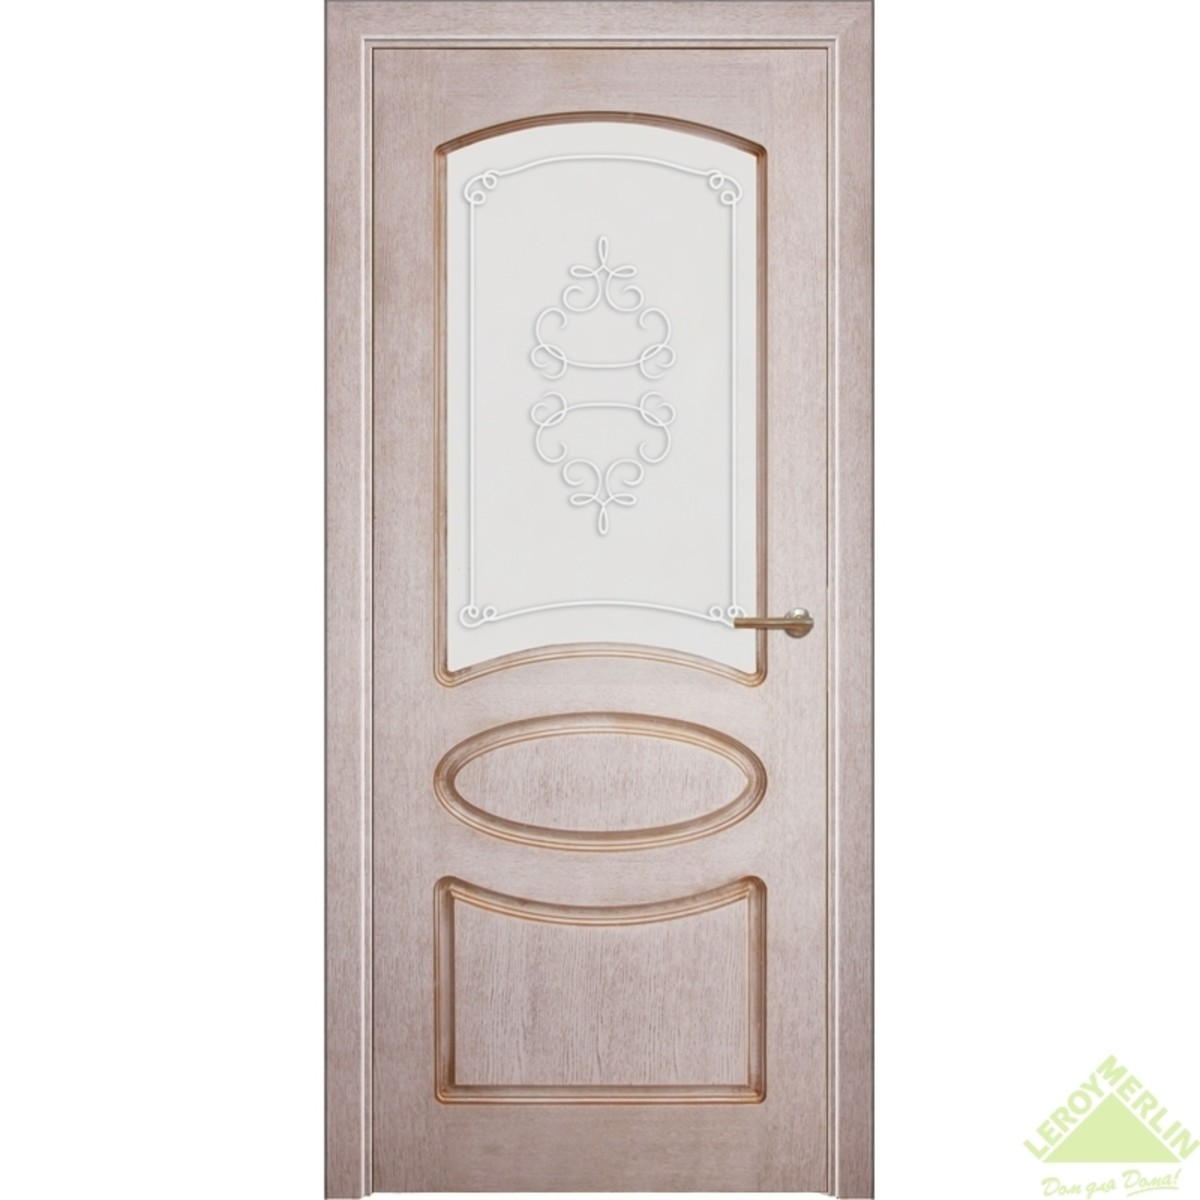 Дверь Межкомнатная Остеклённая 701 900x2000 Шпон Дуб Патина